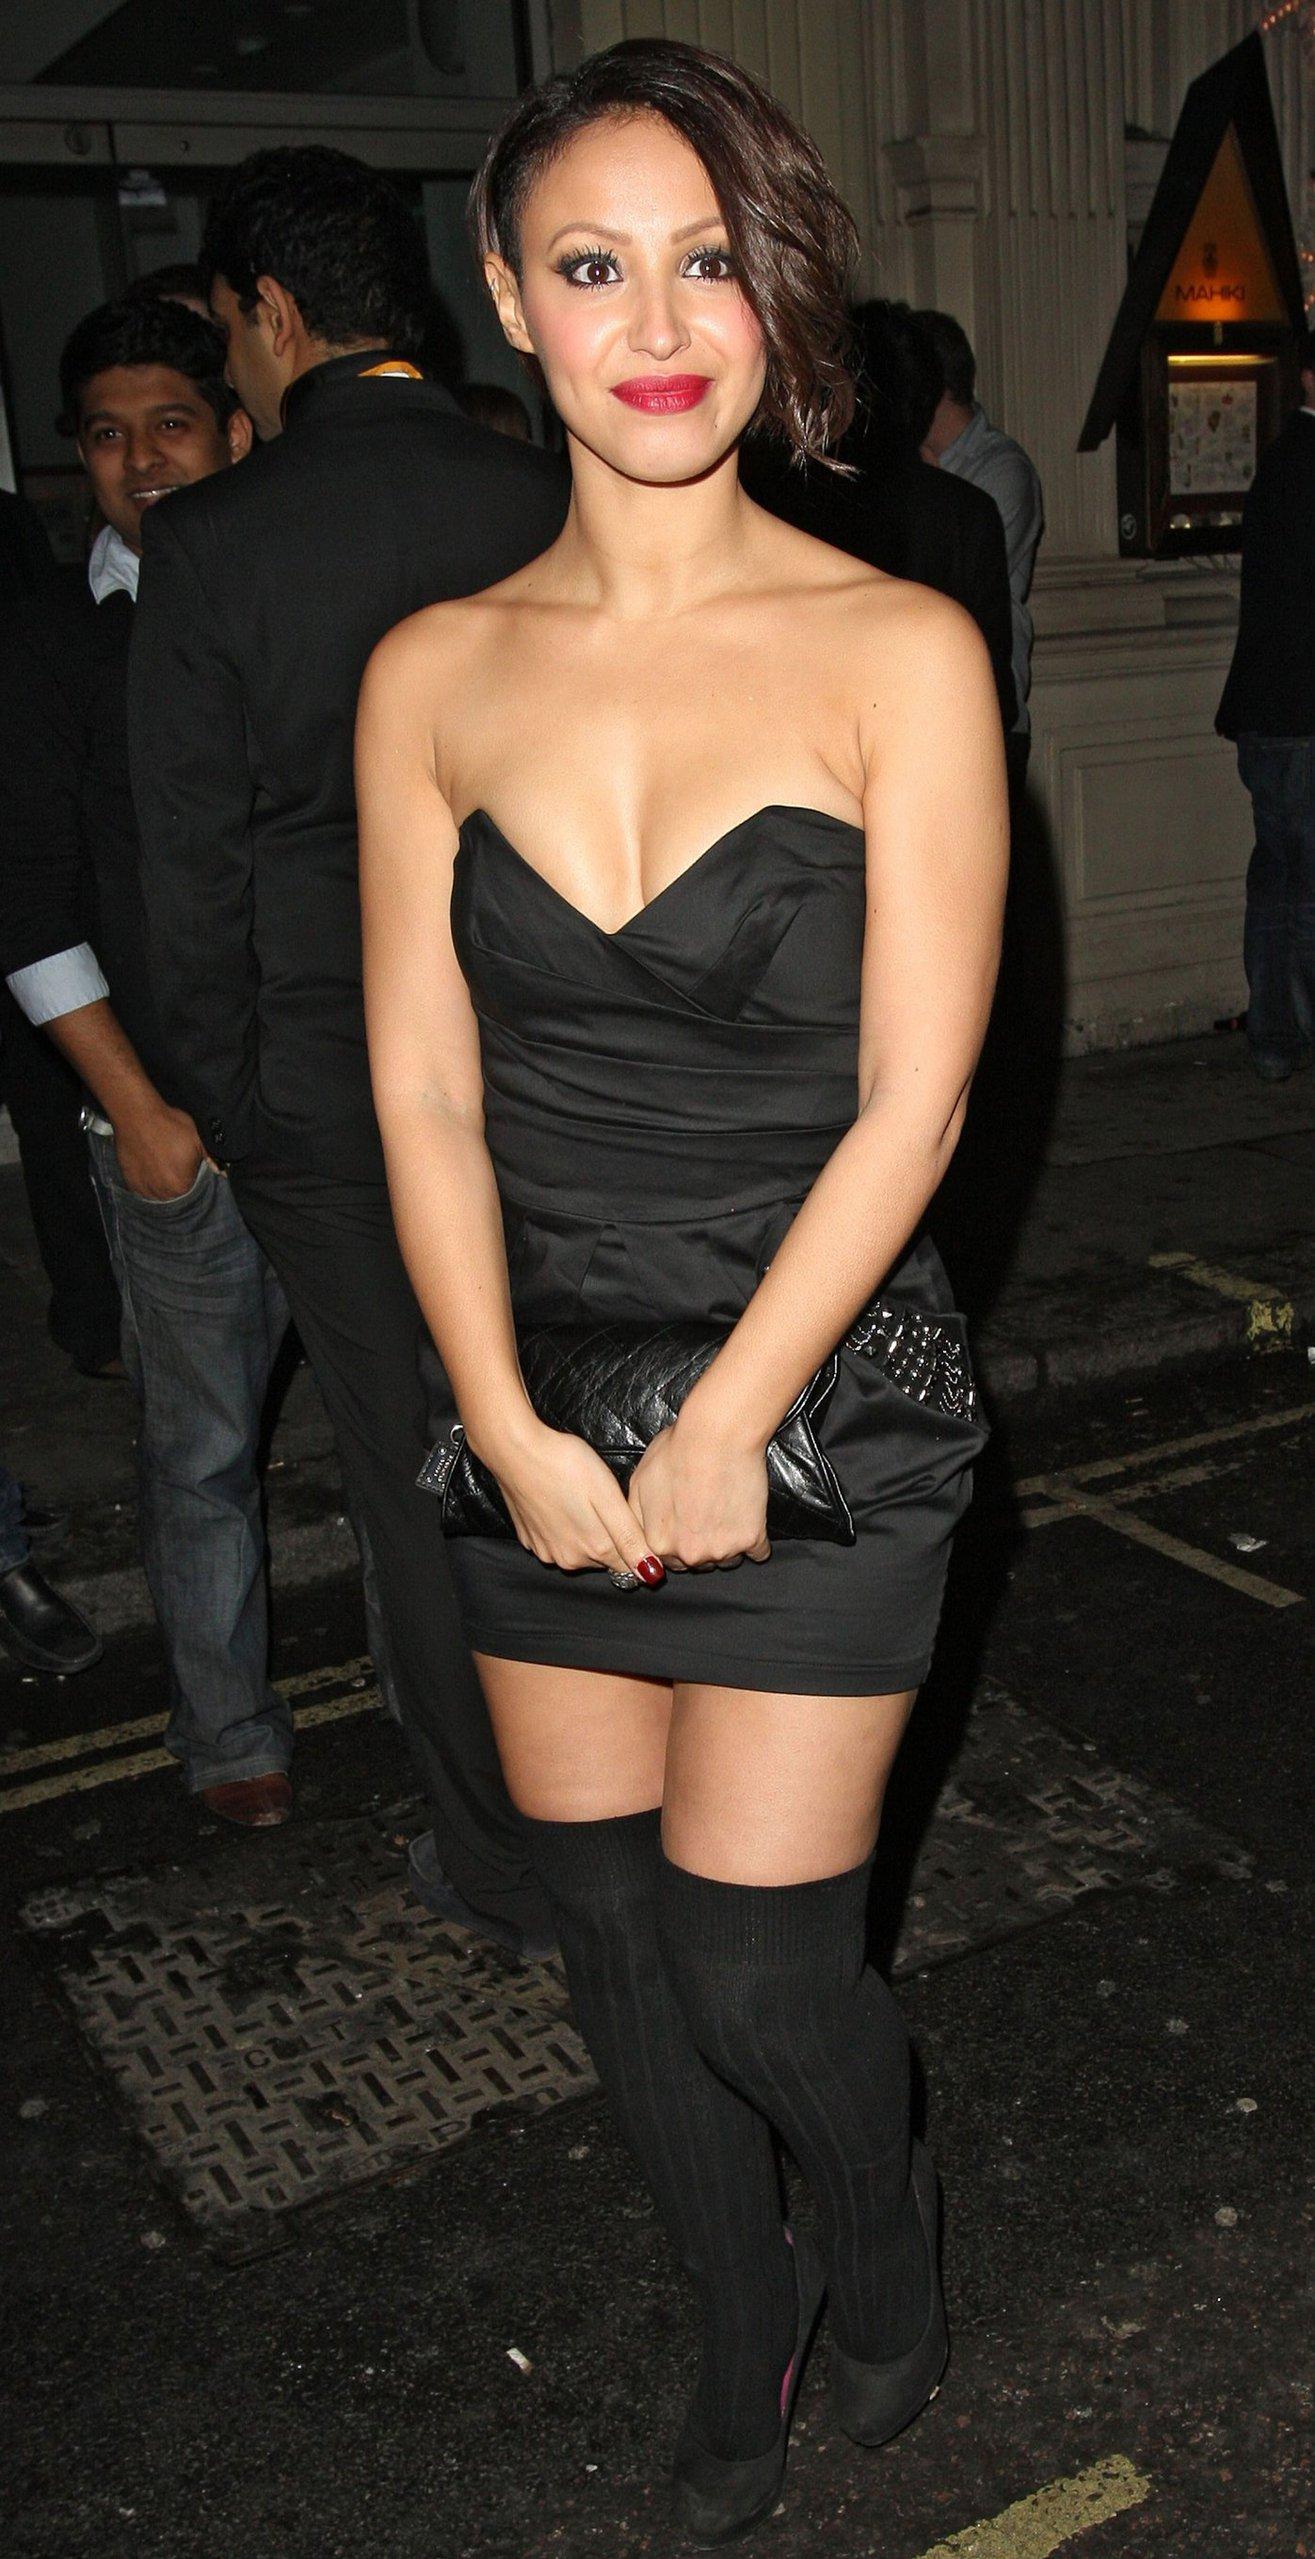 Amelle Berrabah Mahiki X-mas party on December 16, 2010